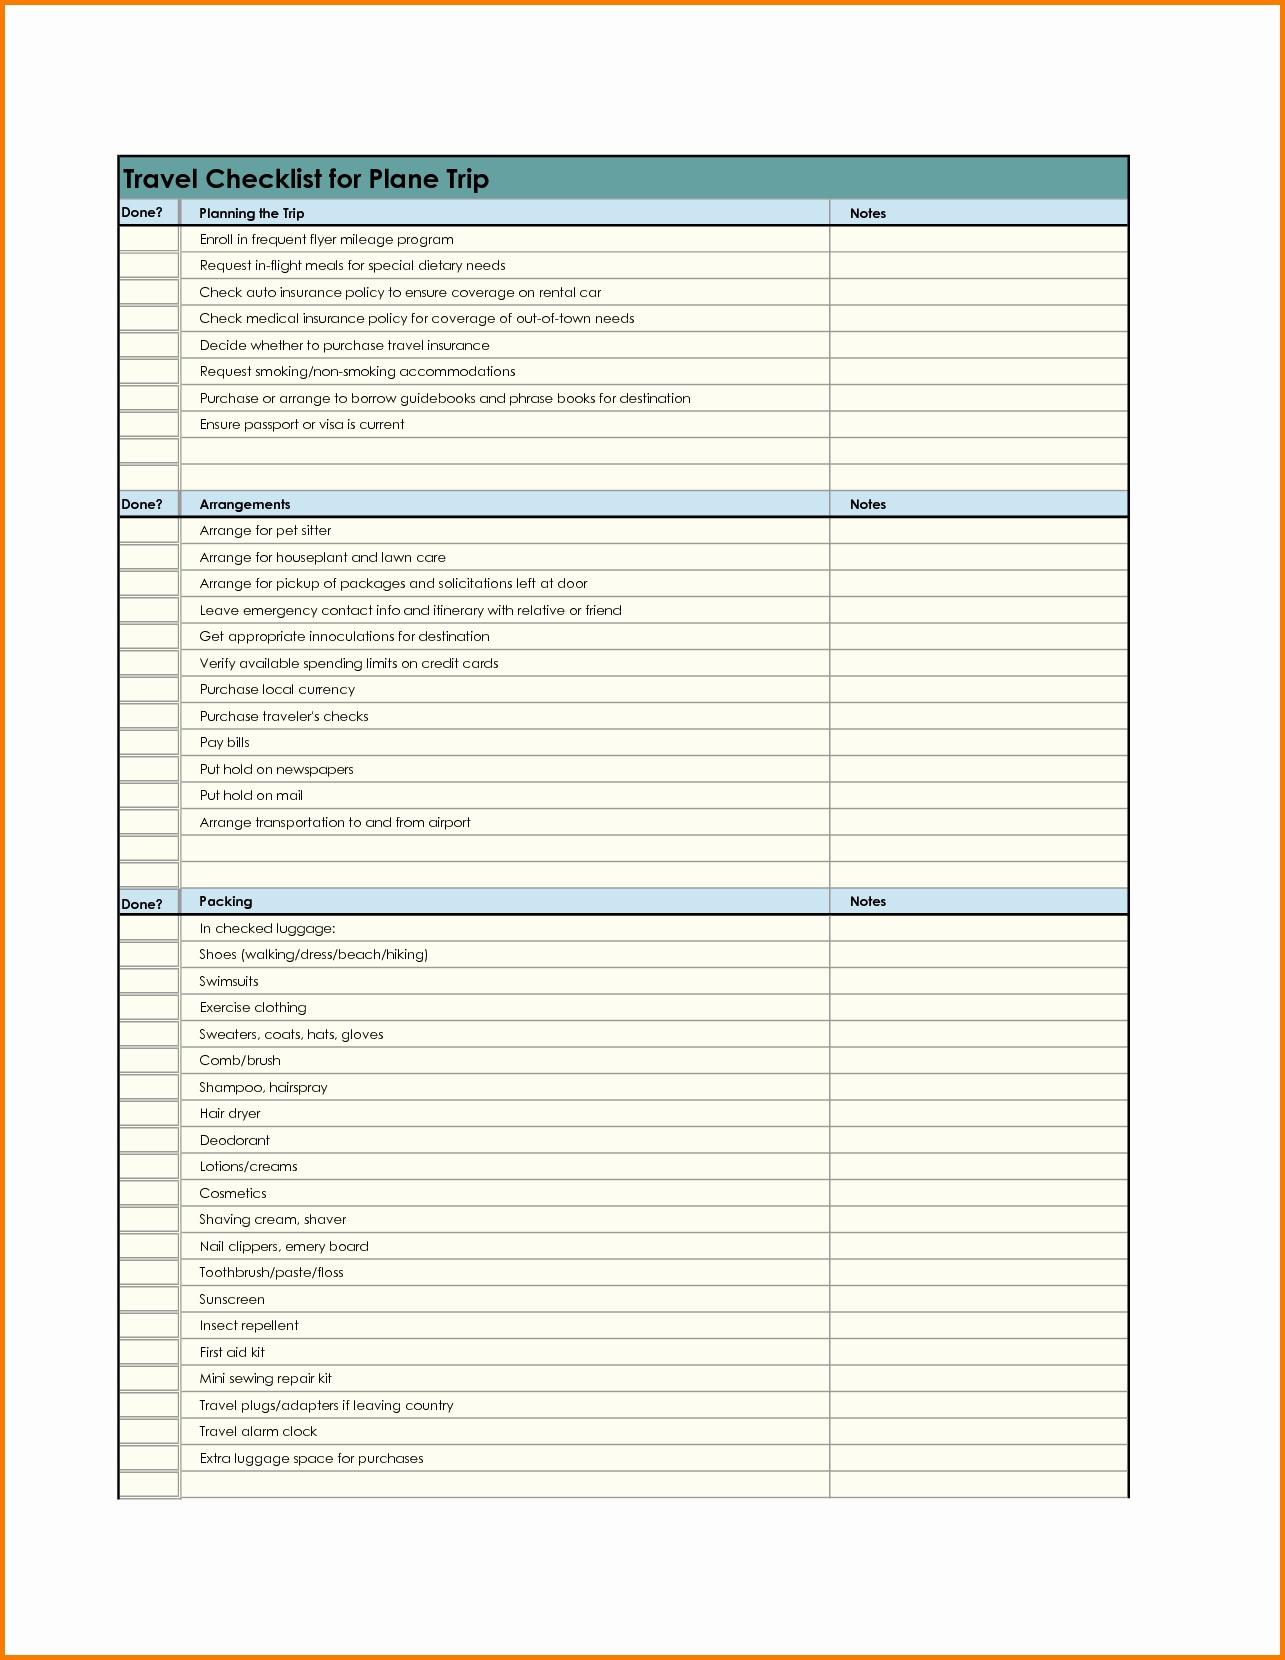 Destination Wedding Budget Spreadsheet For Destination Wedding Budget Spreadsheet Best Of Destination Wedding